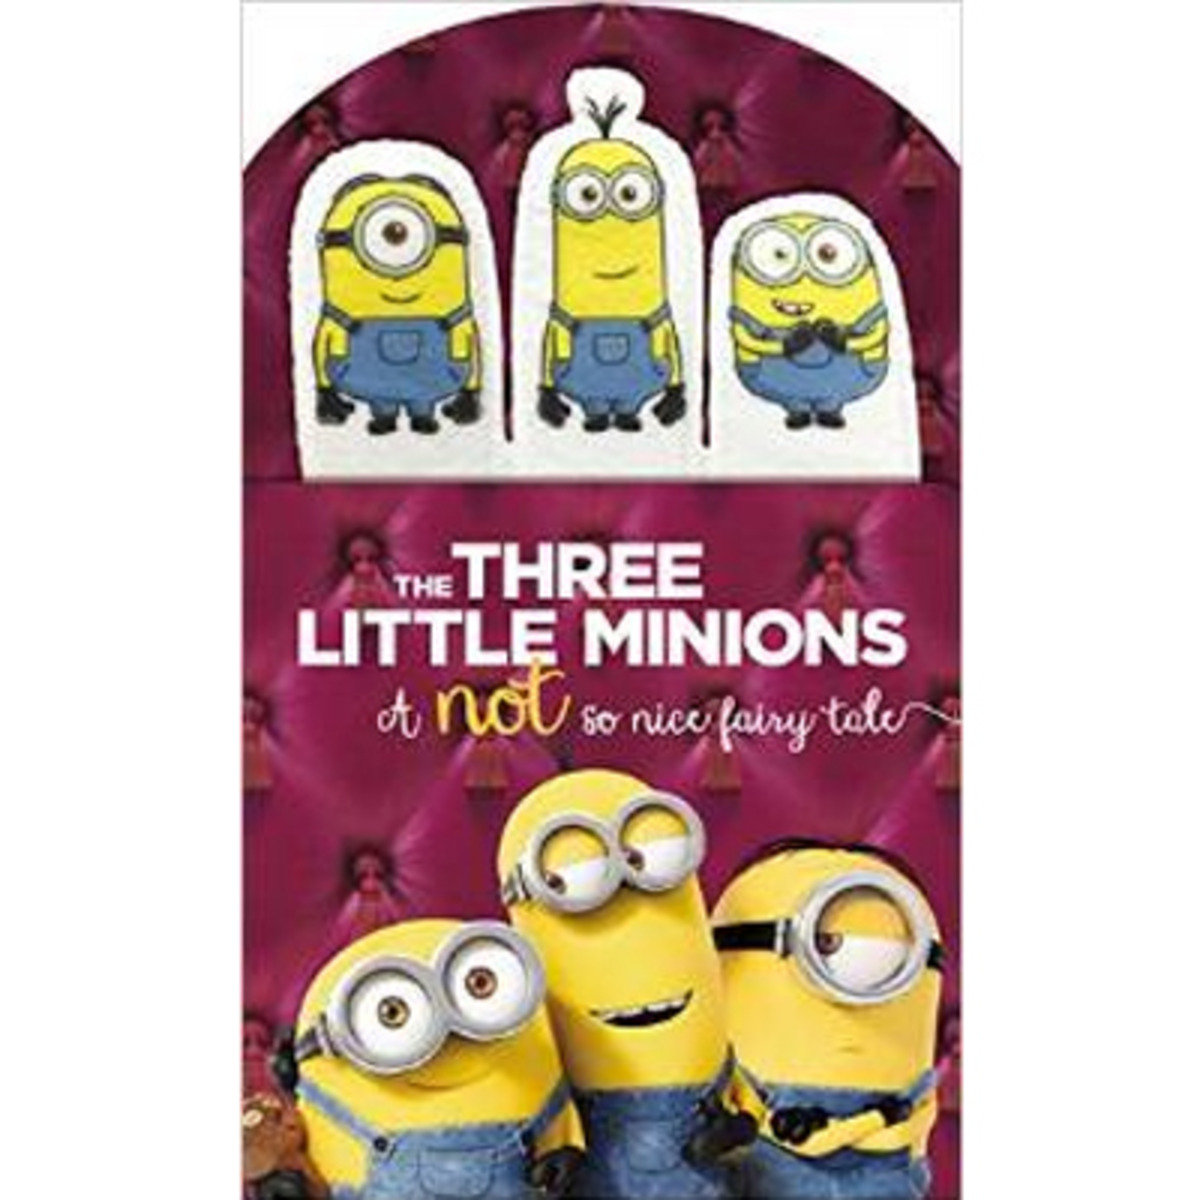 Minions: The Three Little Minions: A Not So Nice Fairy Tale 9780316300902